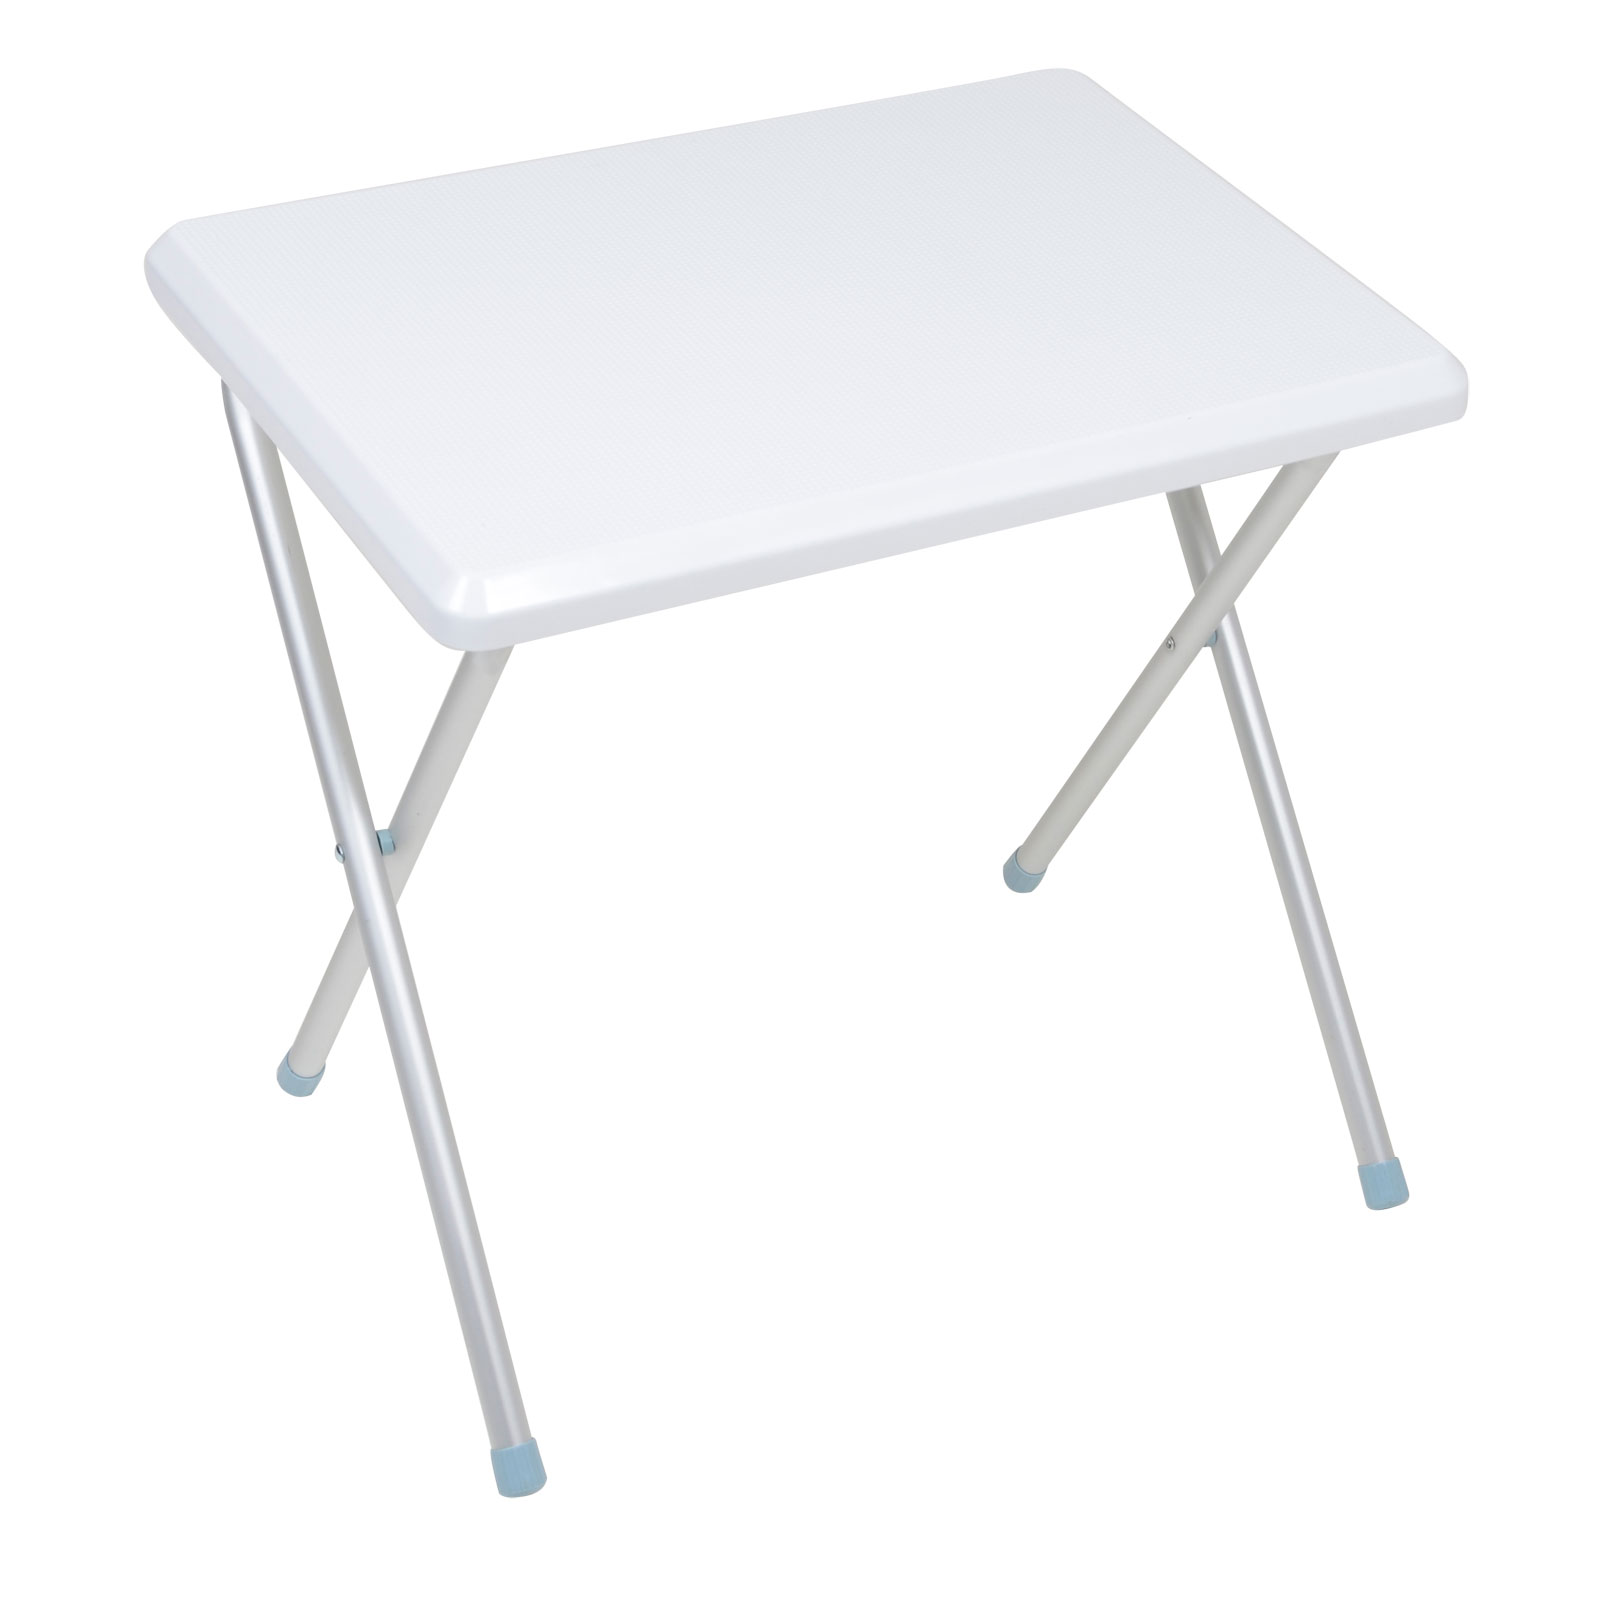 Small Plastic Folding Table